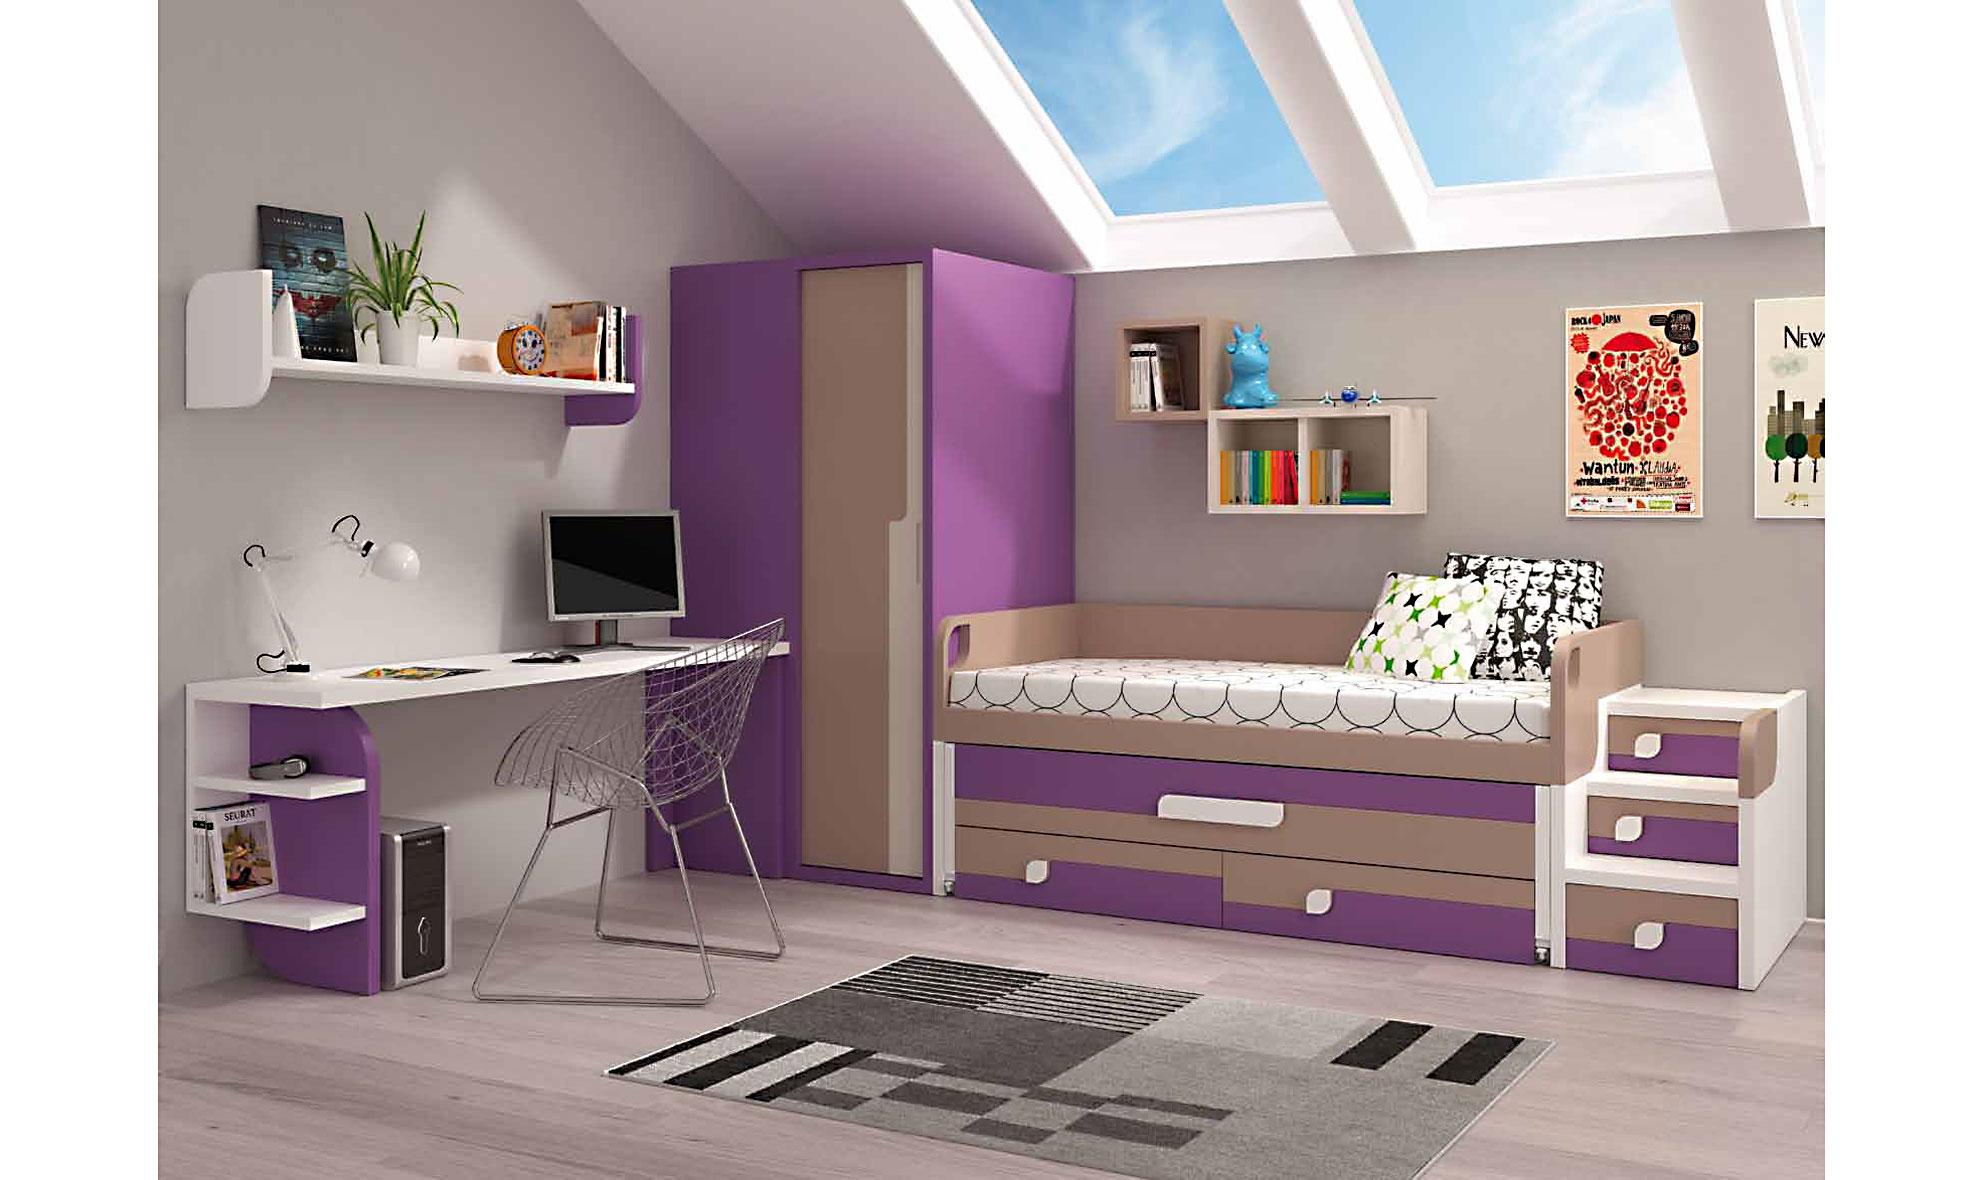 Dormitorio Juvenil Naomi En Portobellostreet Es